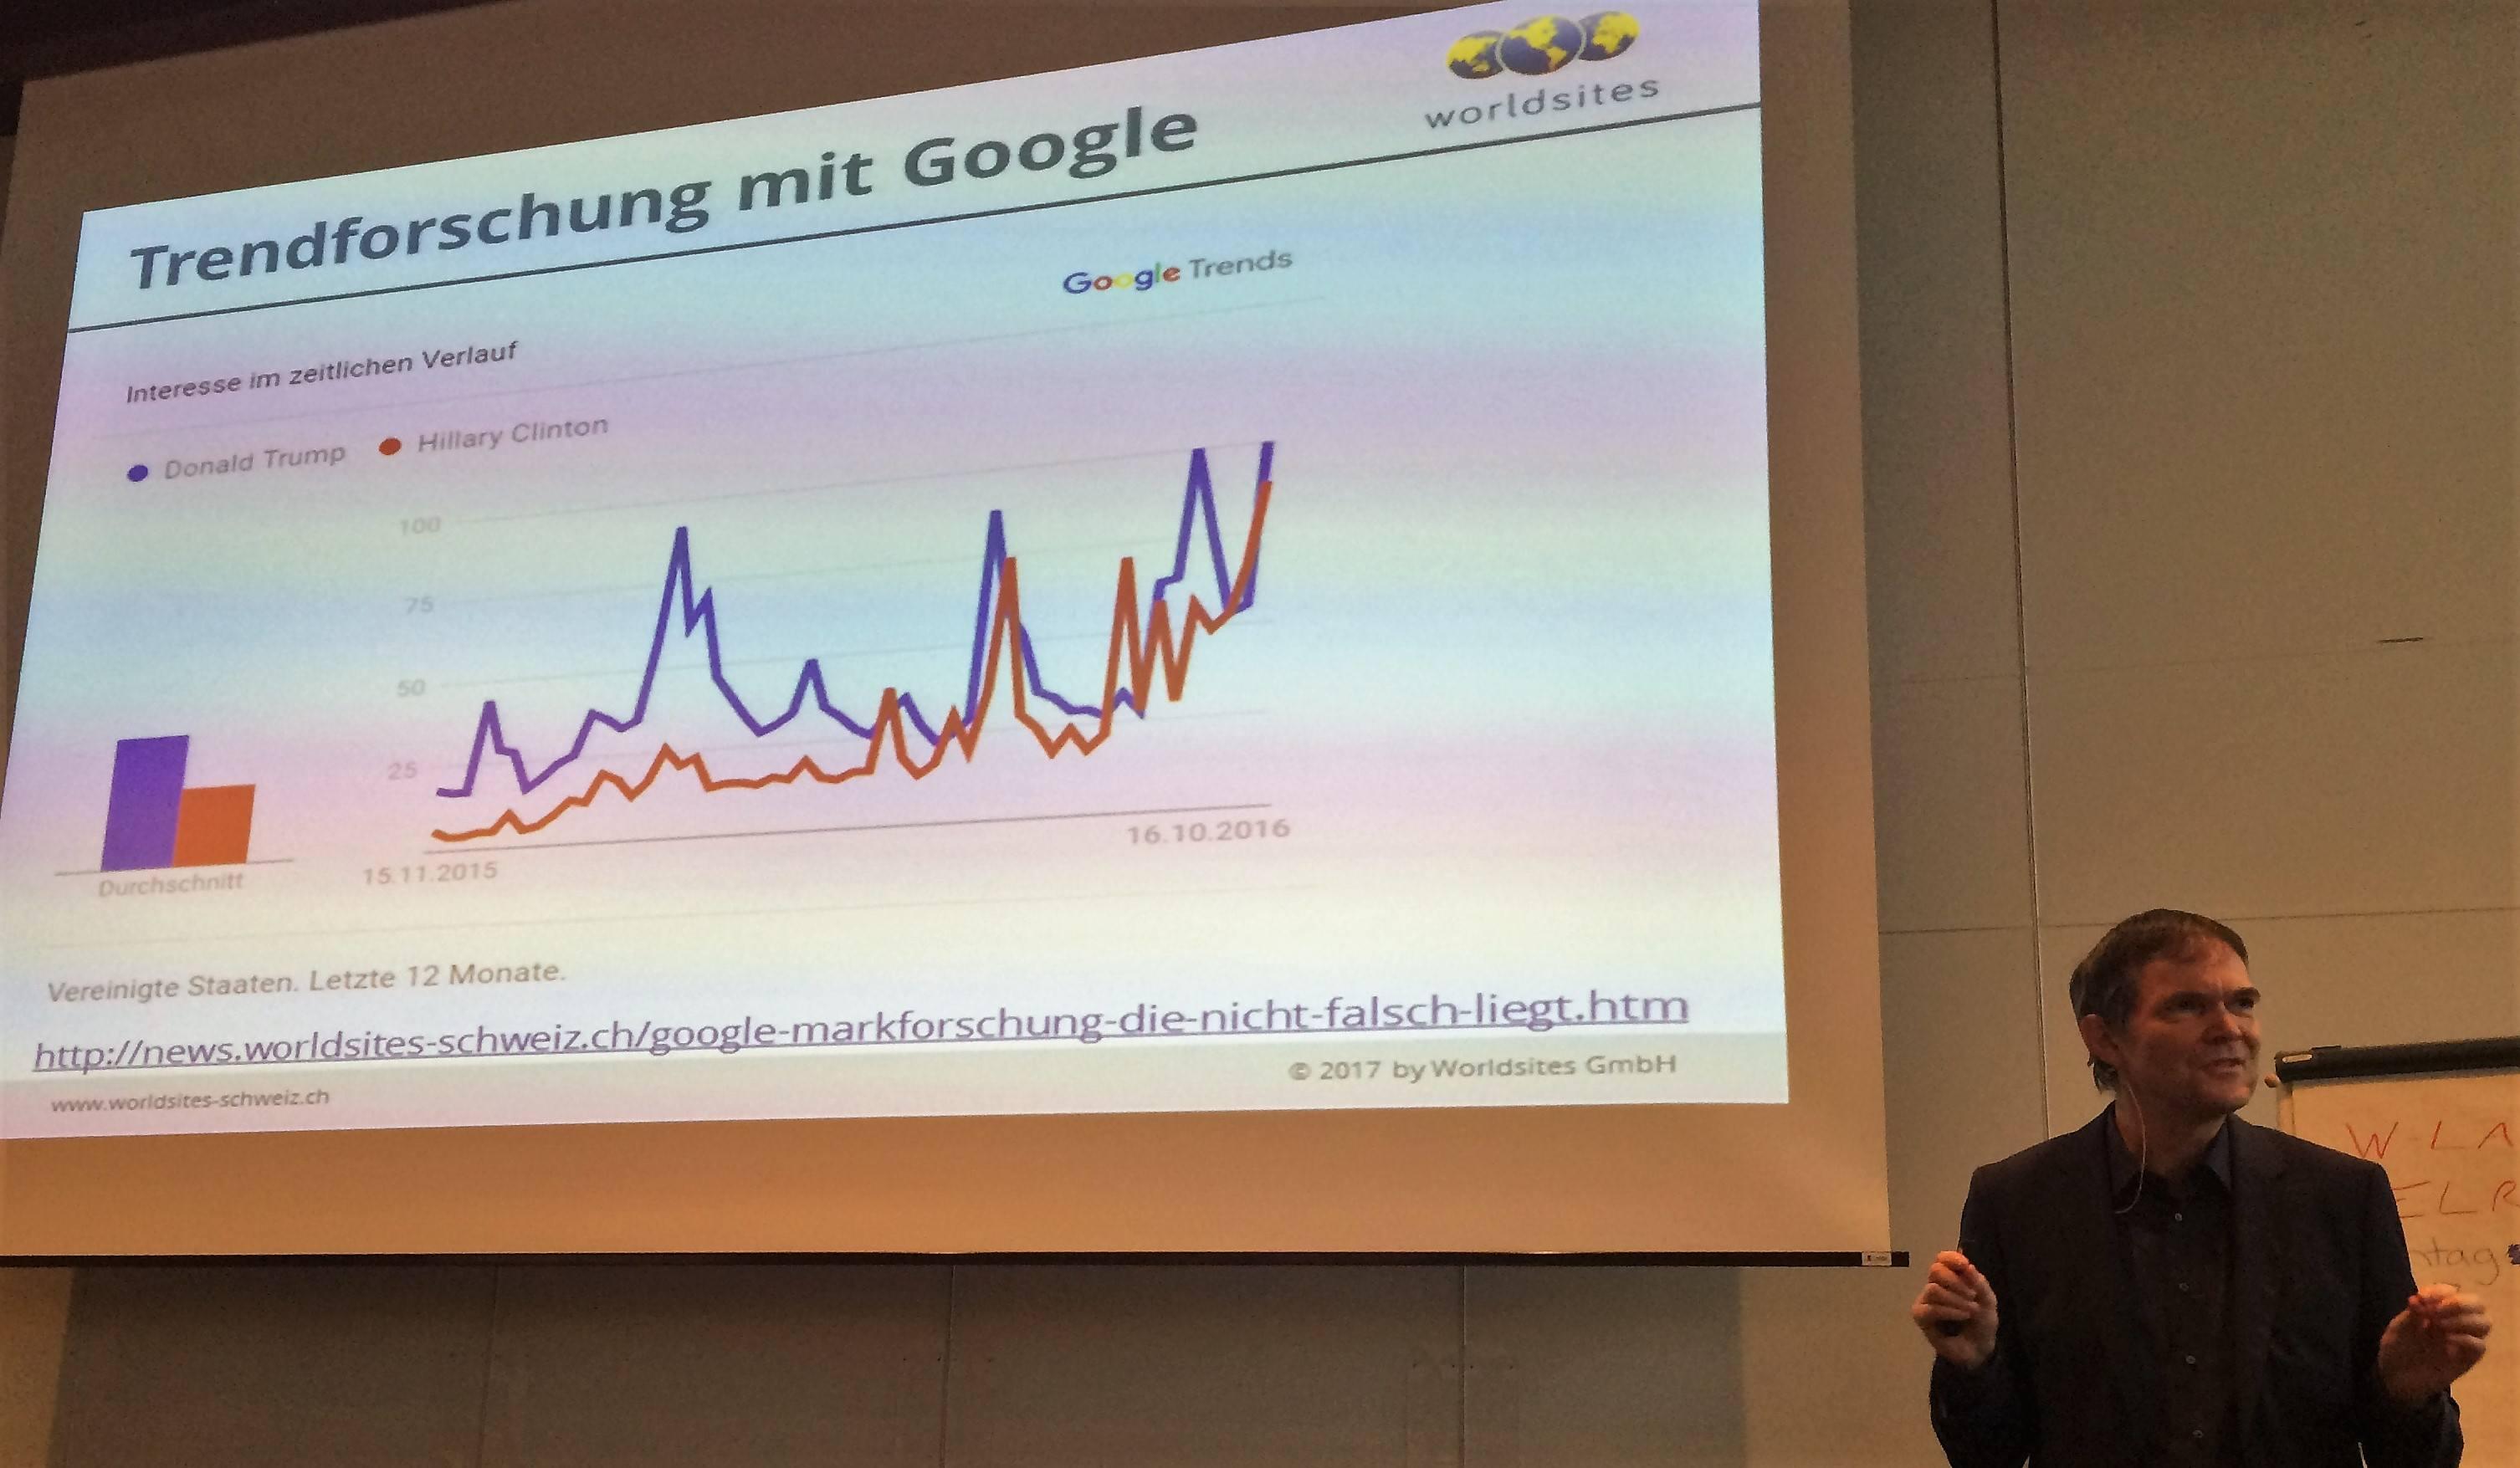 Trendforschung mit Google Trends gemäss Beat Z'graggen